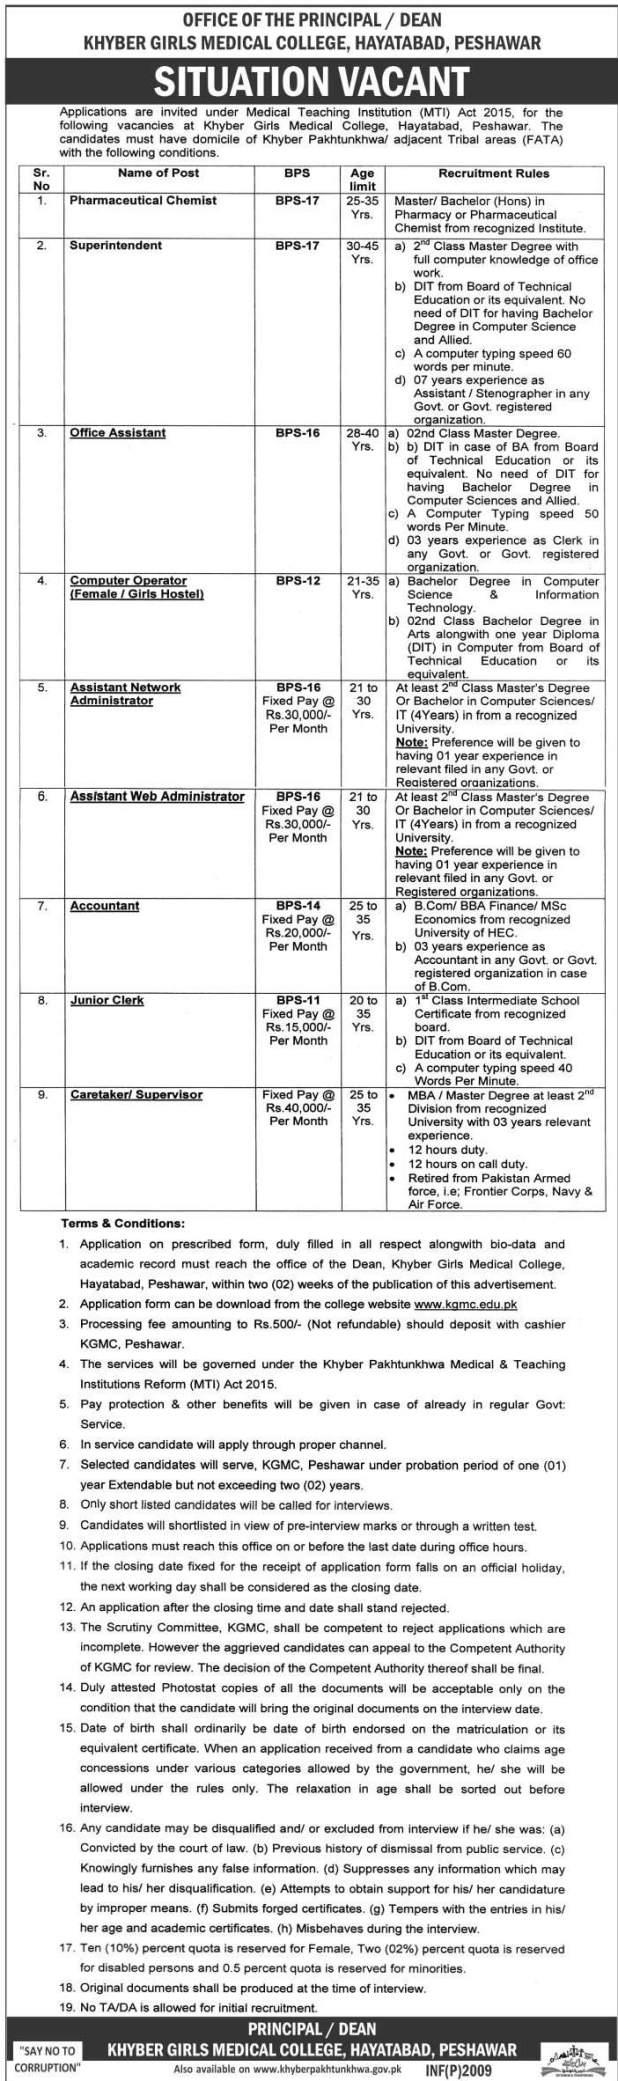 Khyber Girls Medical College Hayatabad Peshawar Jobs